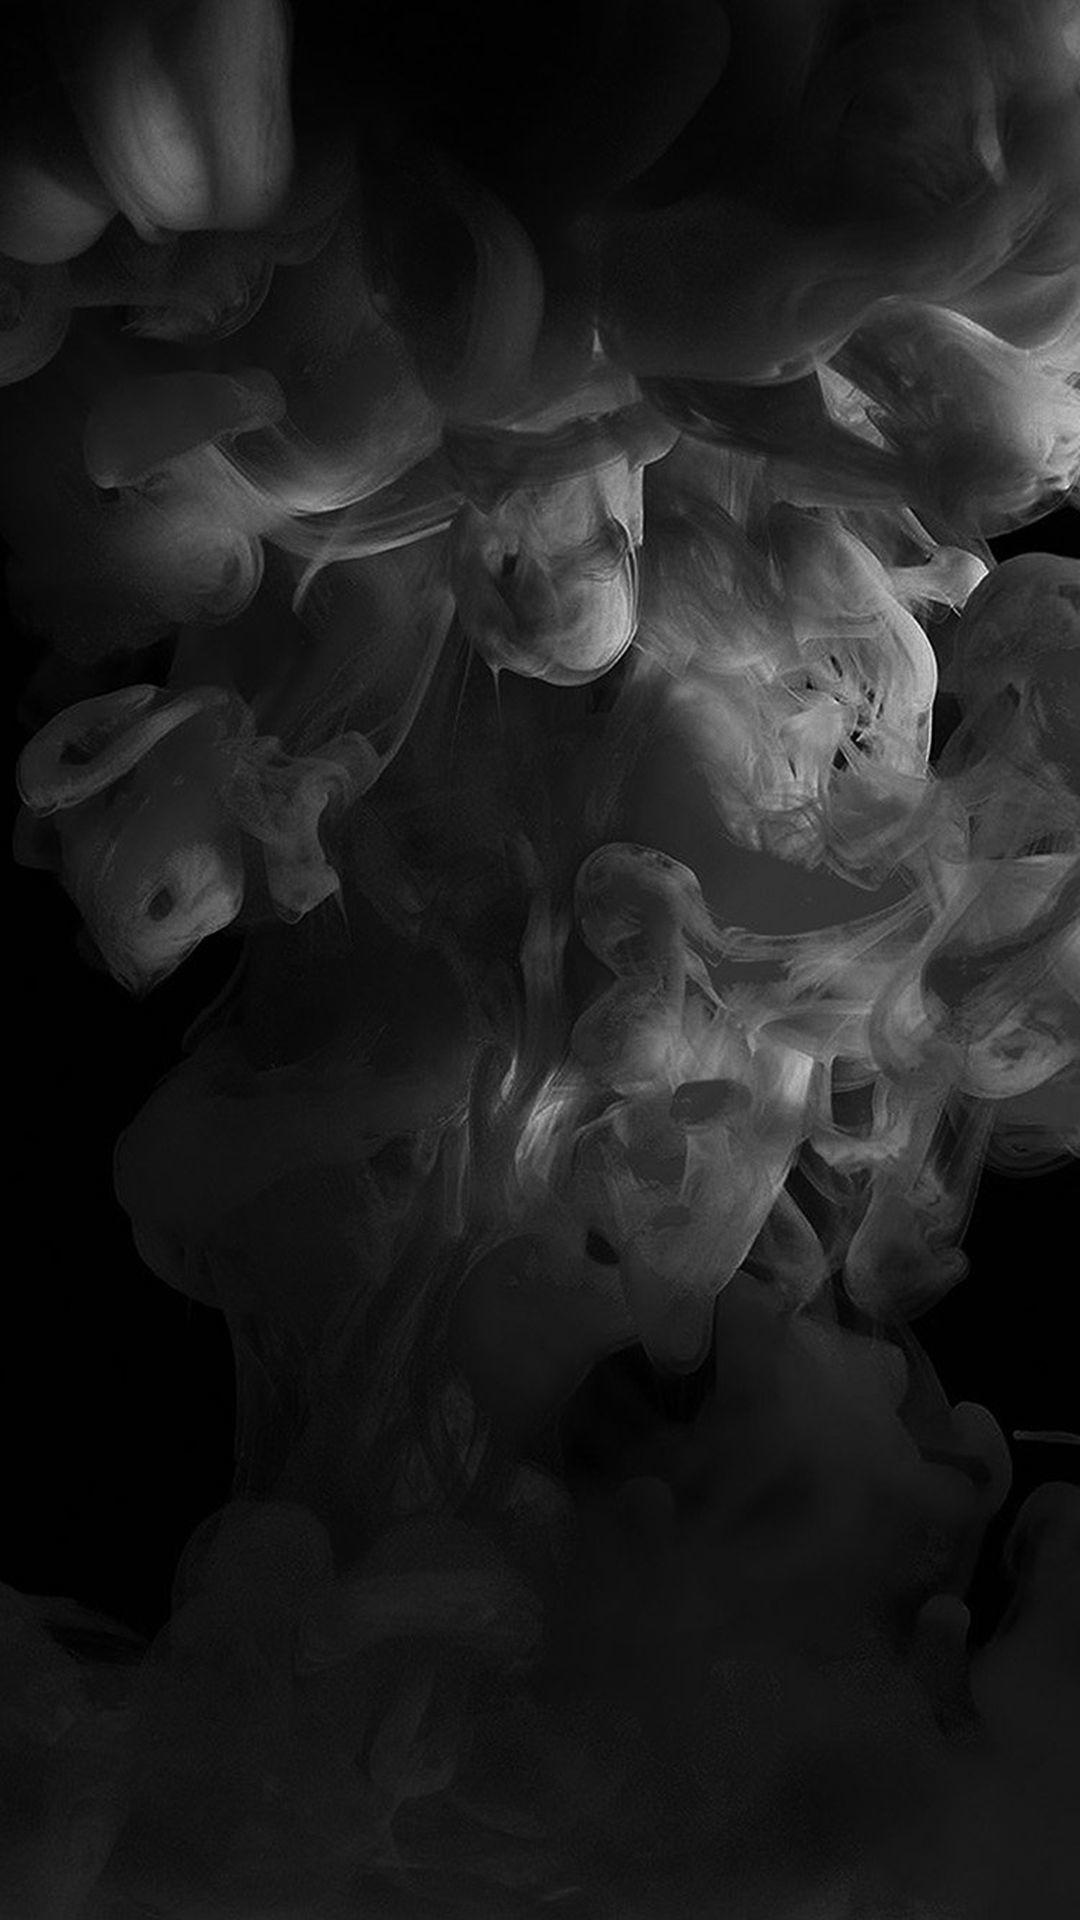 1080x1920 Smoke Dark Bw Abstract Fog Art Illust Abstract Black Wallpaper Iphone X 1080x1920 Wallpaper Teahub Io